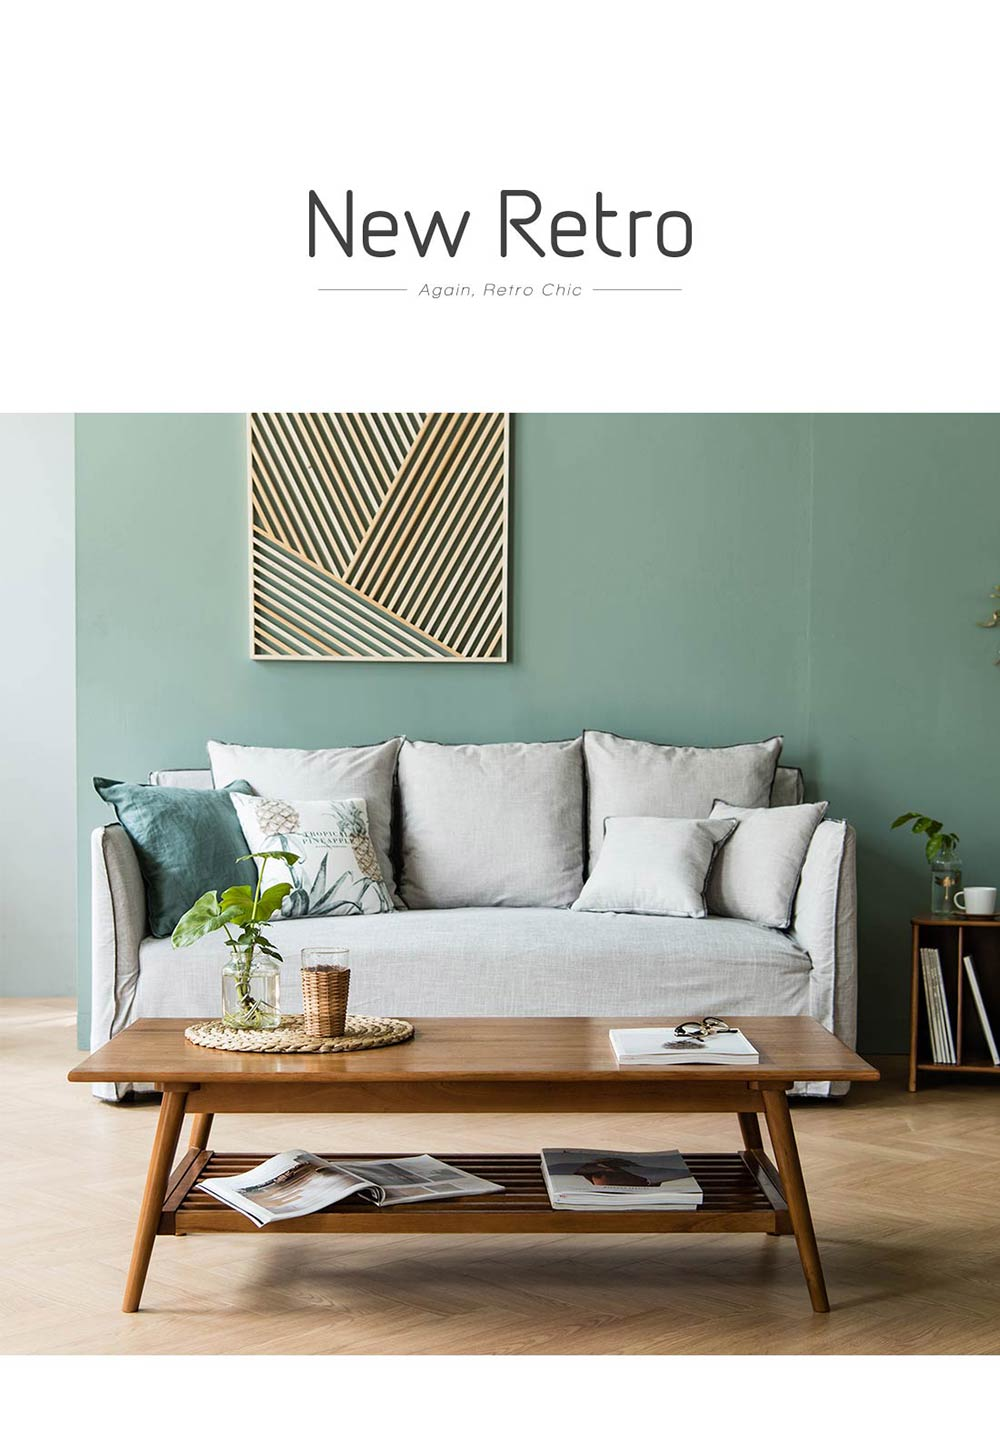 New Retro Sofa Table, Online, Furniture, Singapore,